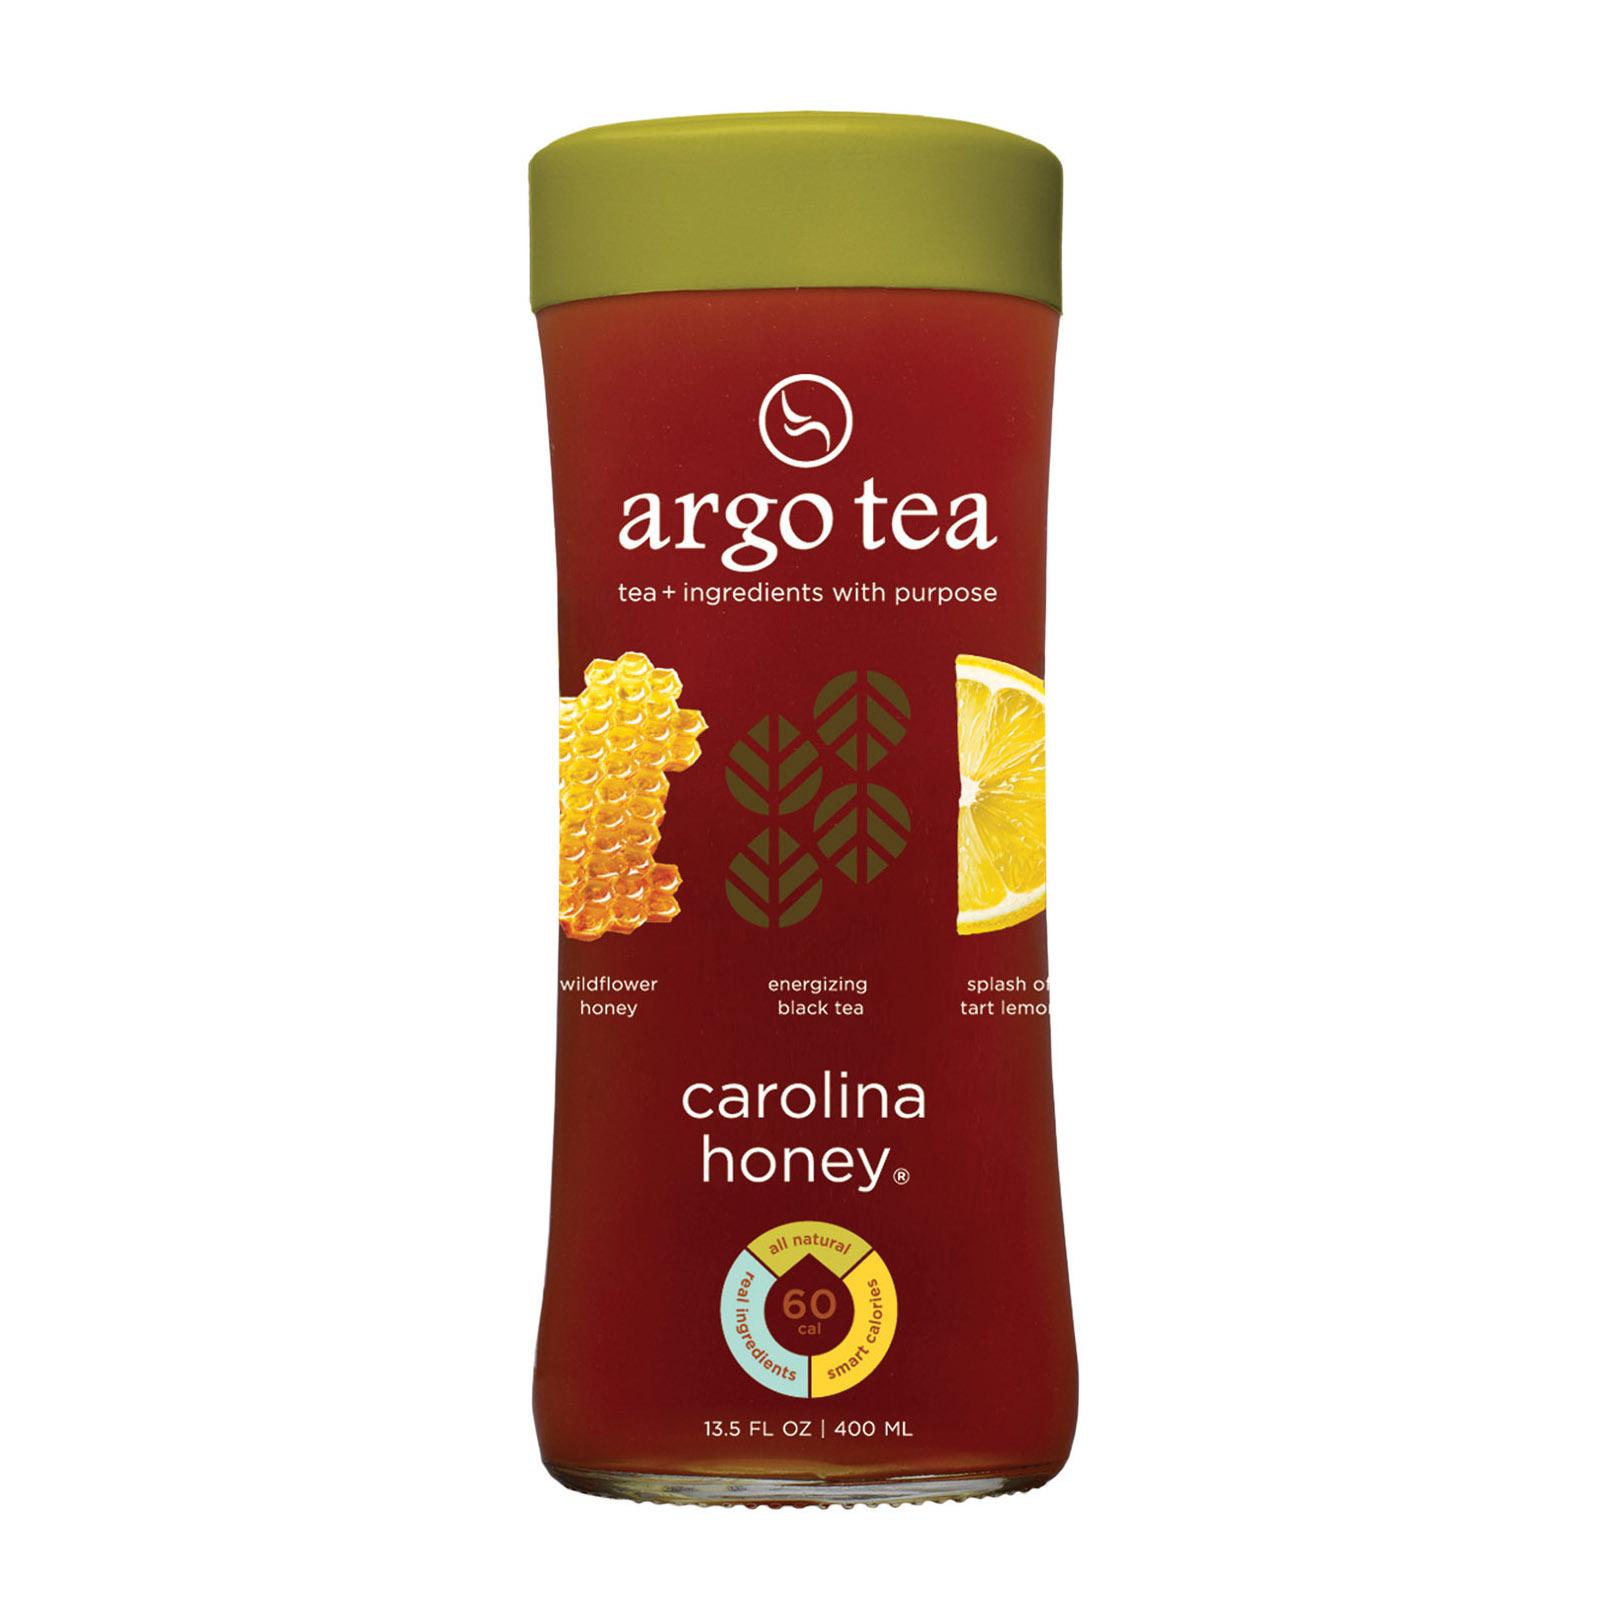 Argo Tea Iced Green Tea - Carolina Honey - Case of 12 - 13.5 Fl oz.